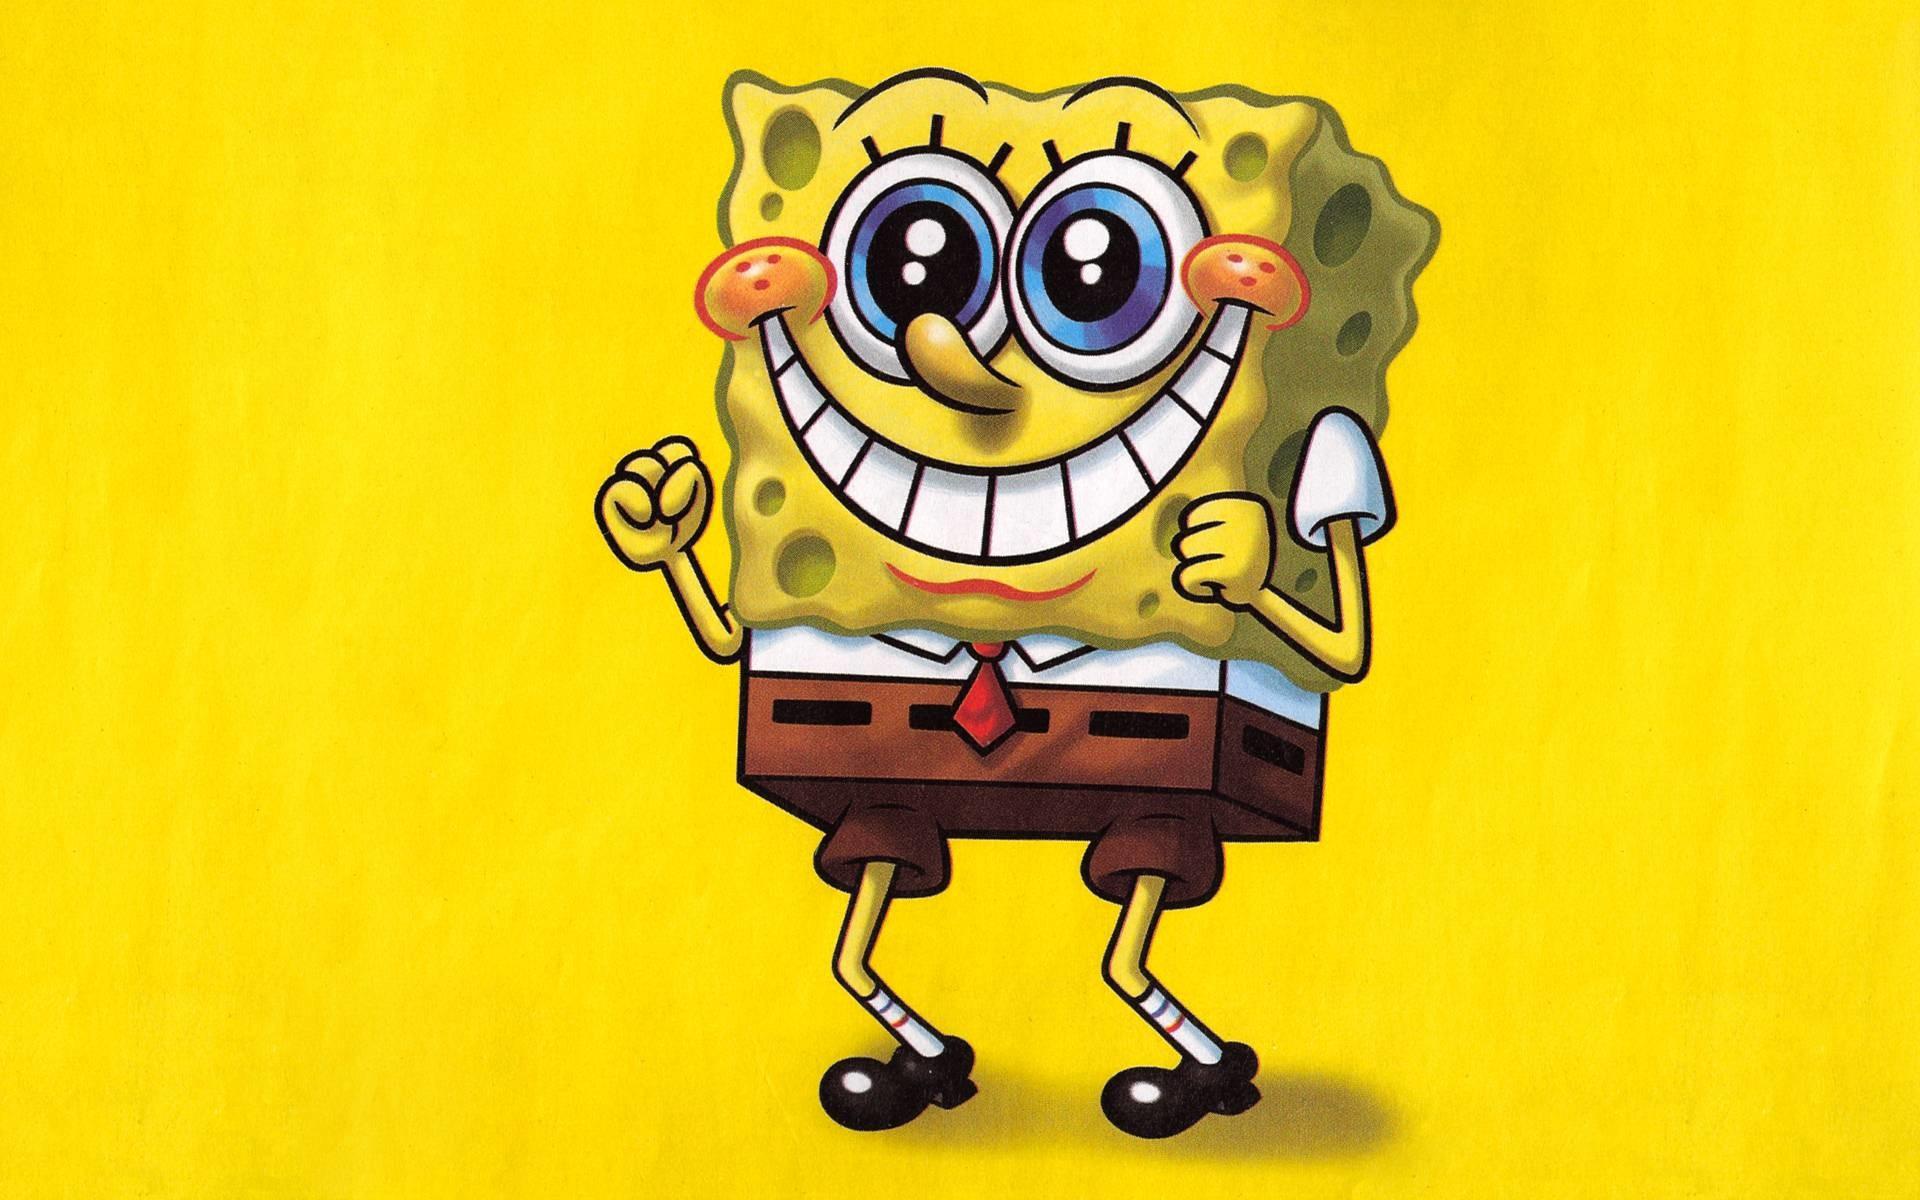 Spongebob Wallpapers – Full HD wallpaper search – page 8